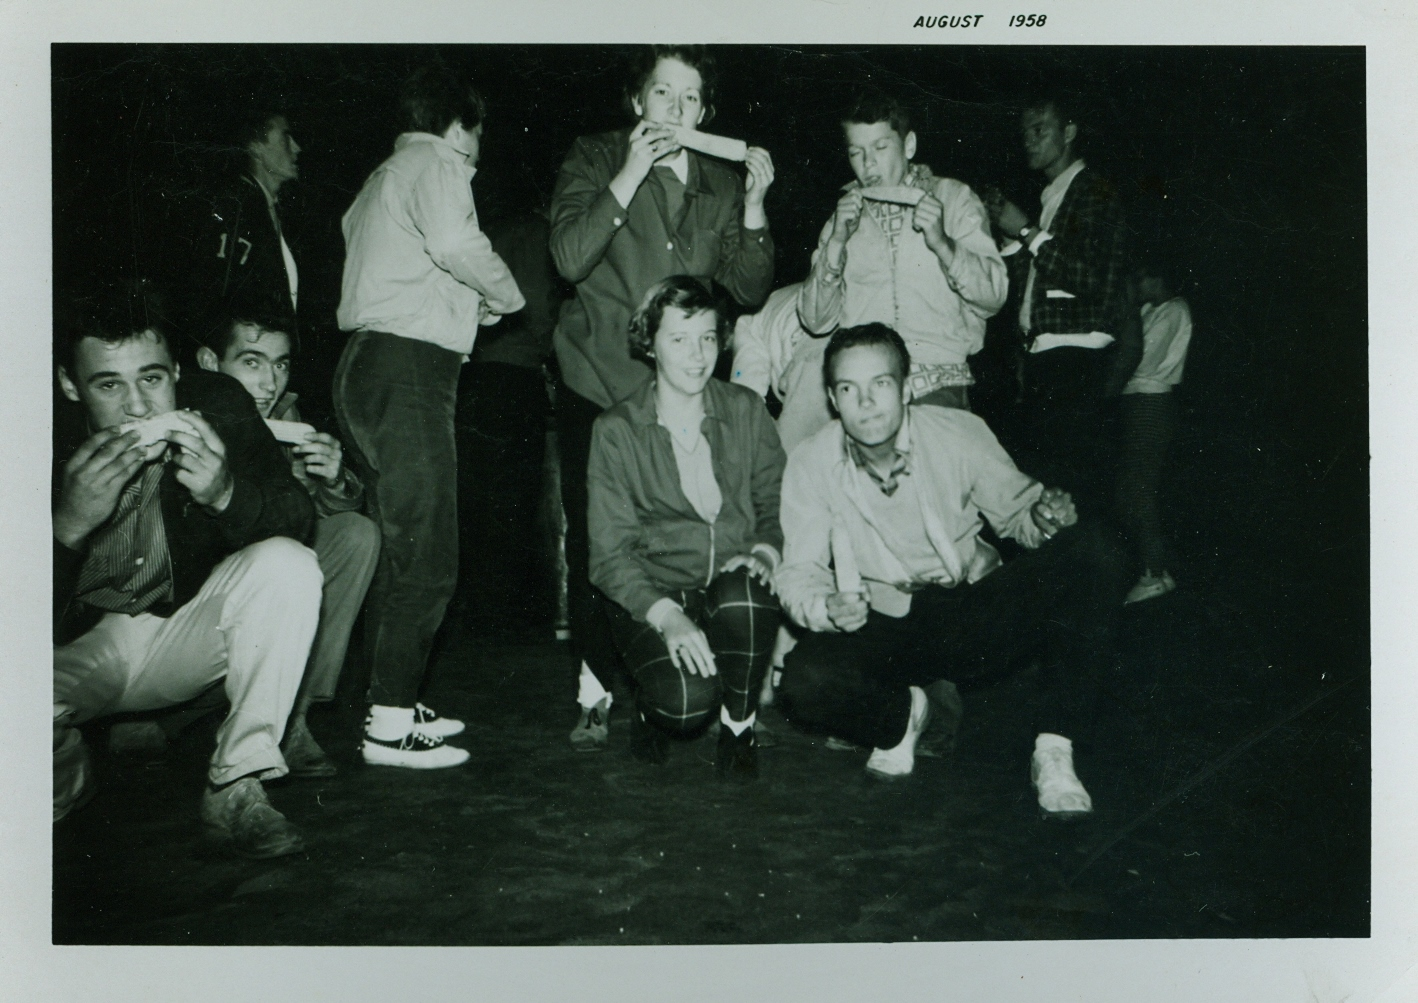 1958 Crowe Lake, Corn Roast, Bob Jenkins, Leo Darrah, Bev Samuels, Chrlotte Austin, Gary Nobes, Brian MacKenzie